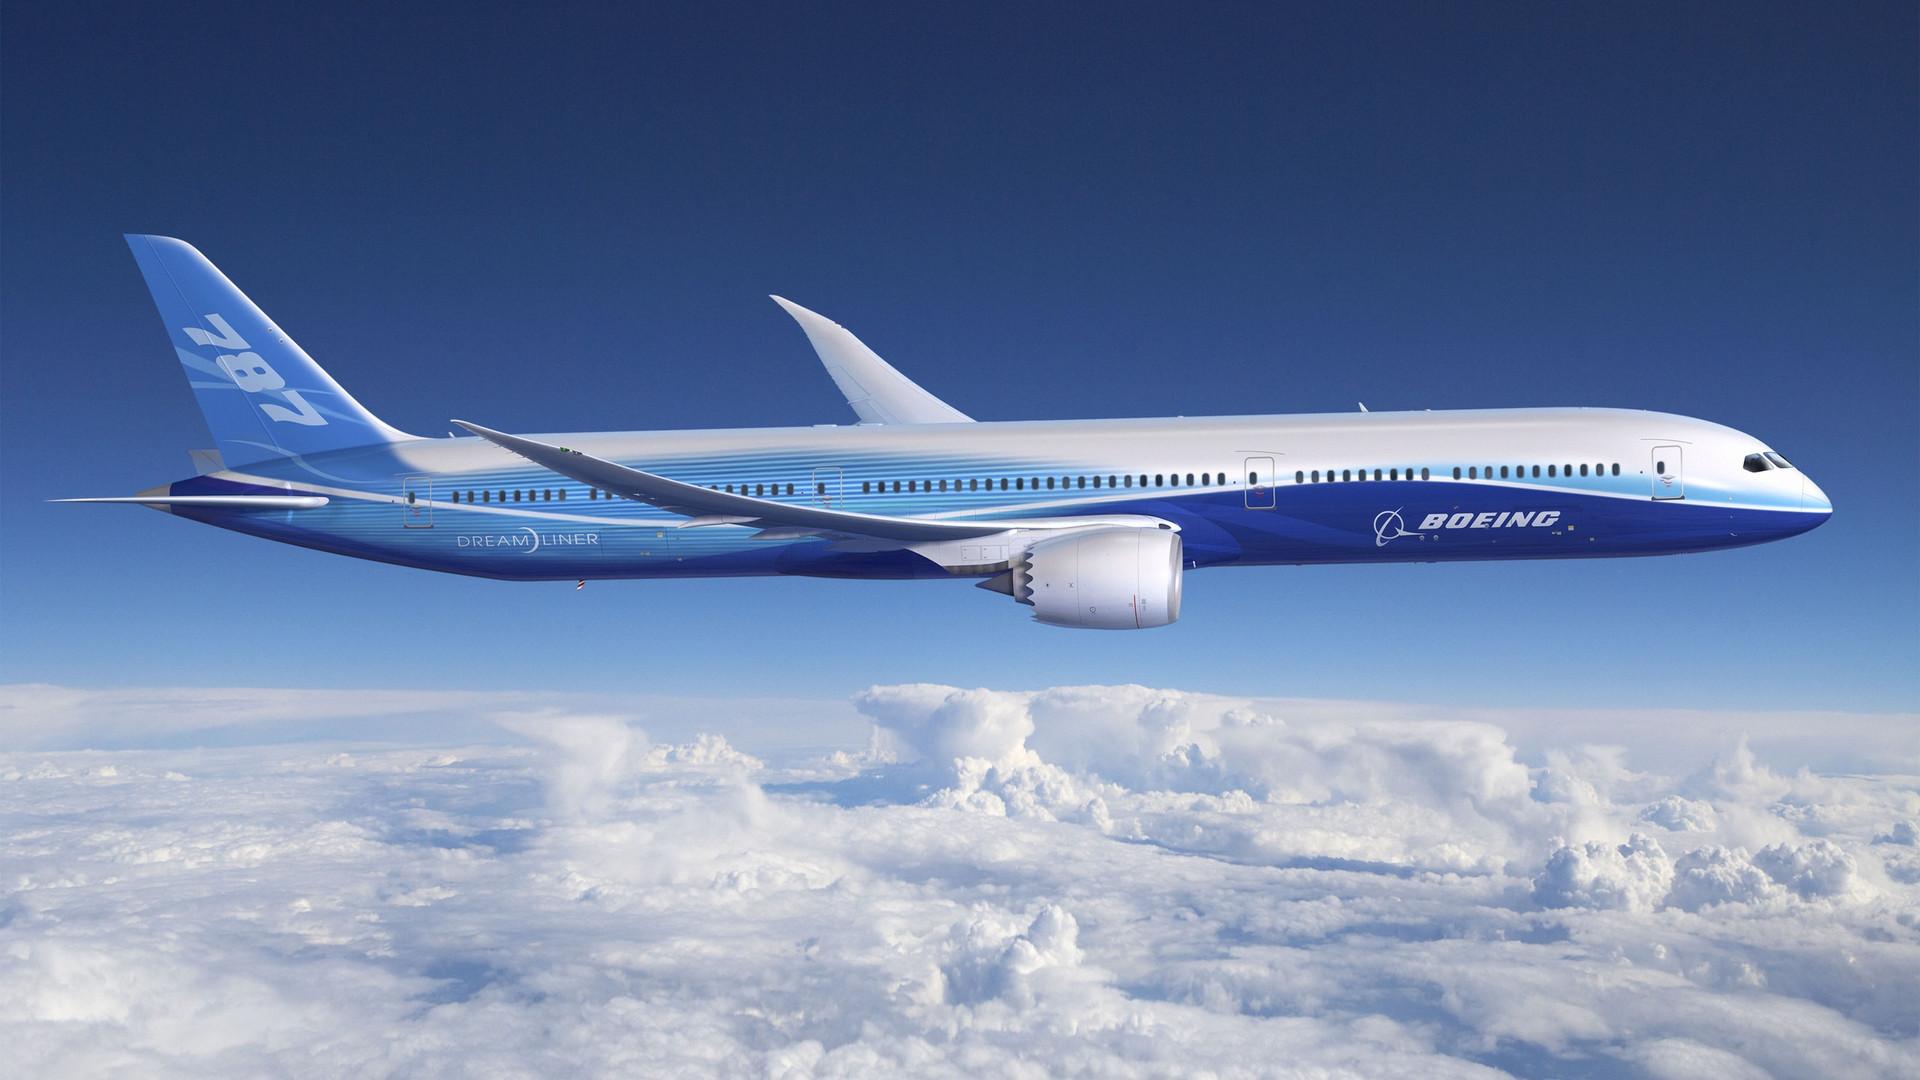 aviation-787-dreamliner-Boeing-sky-airpl